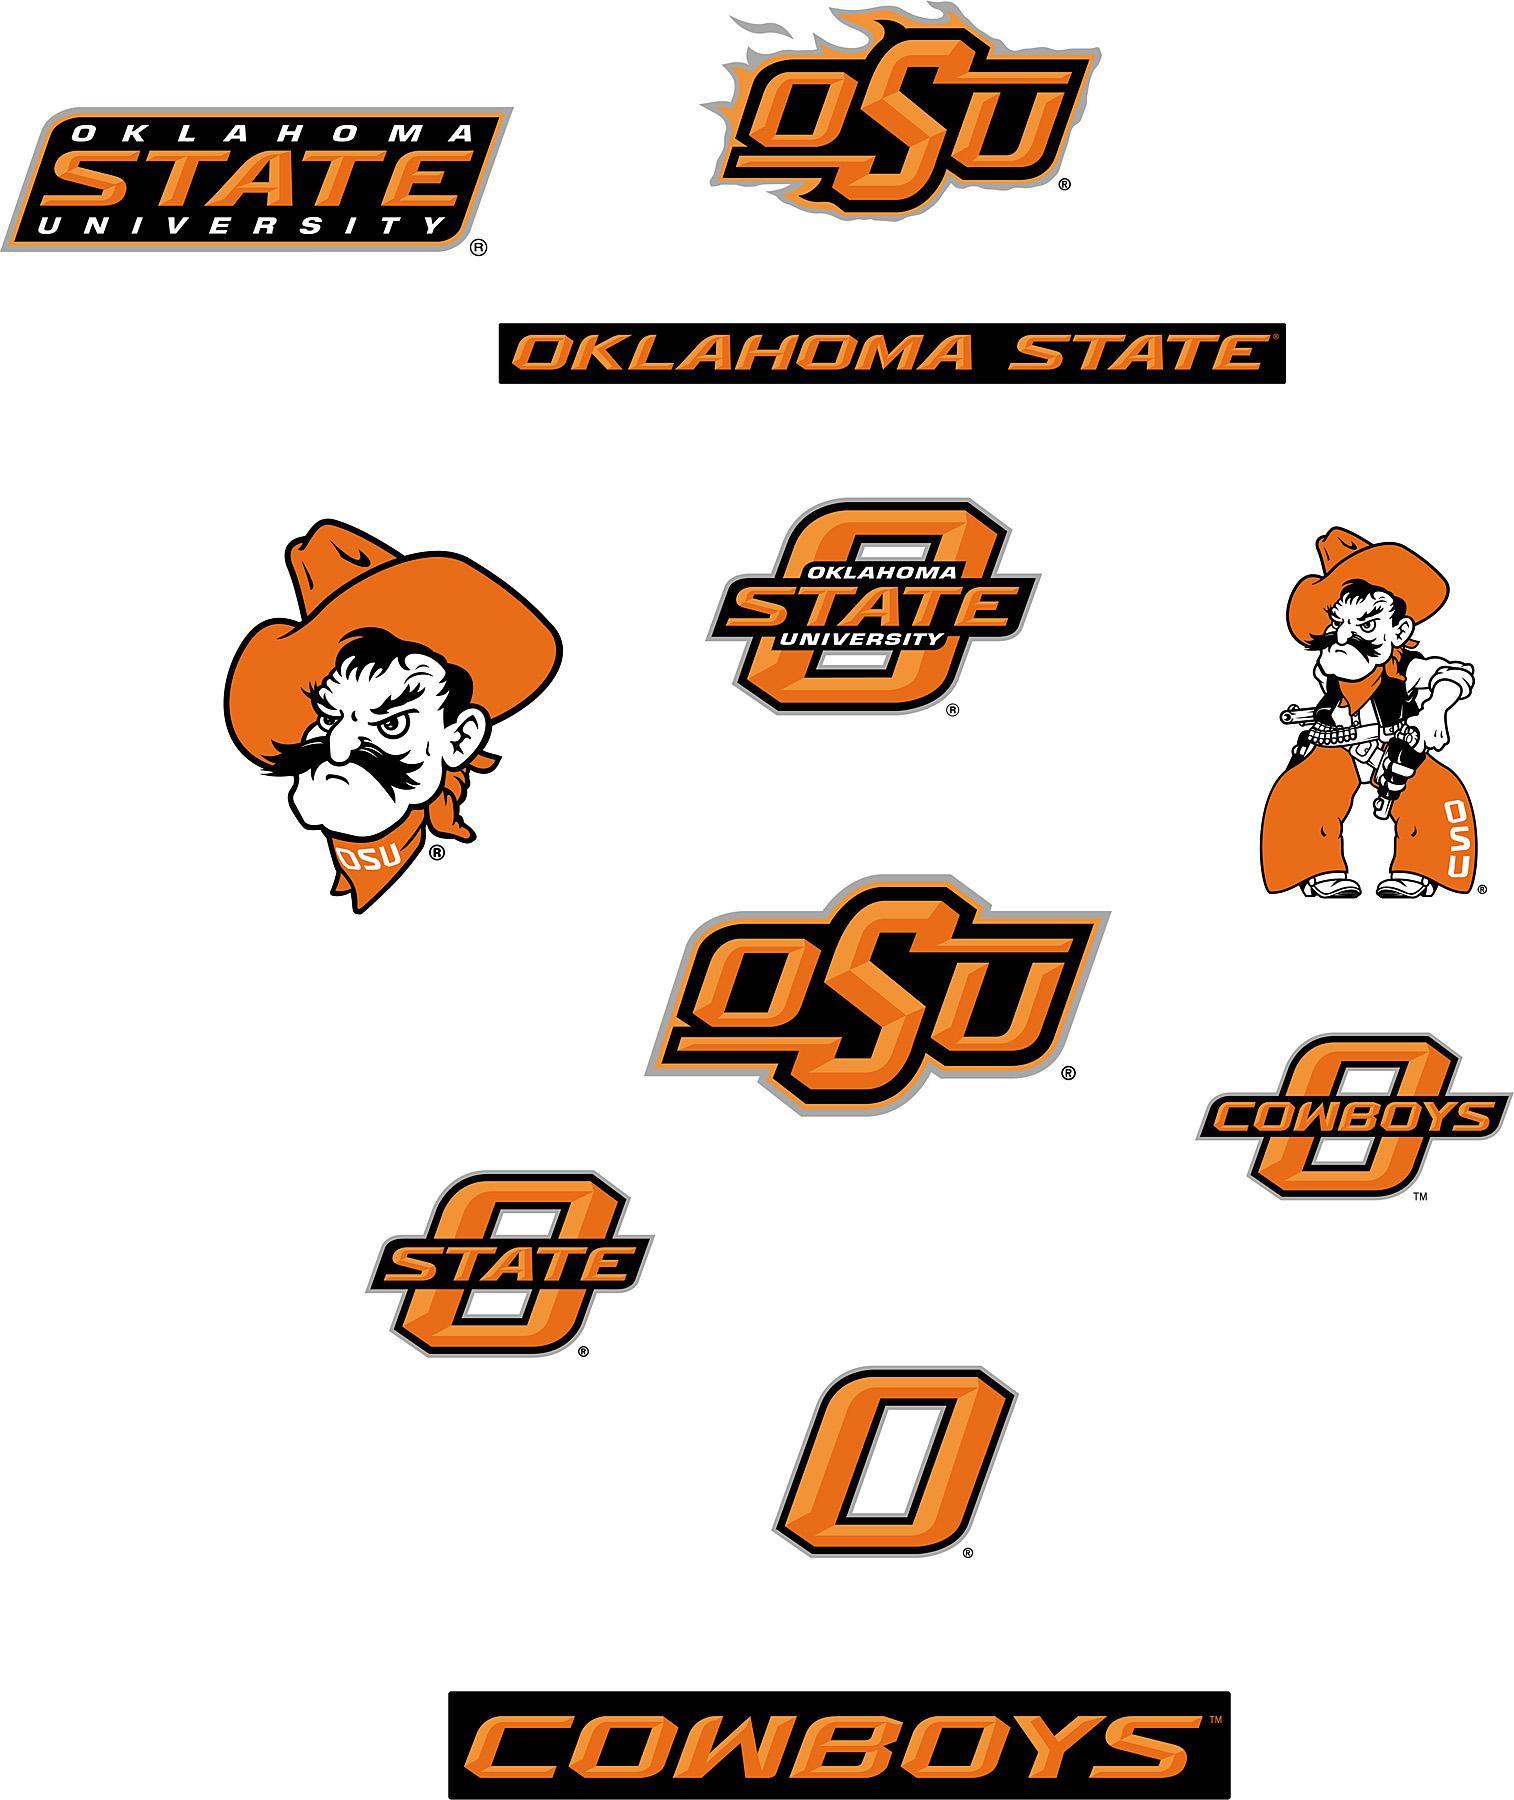 NCAA OSU Cowboys Wallpaper - WallpaperSafari